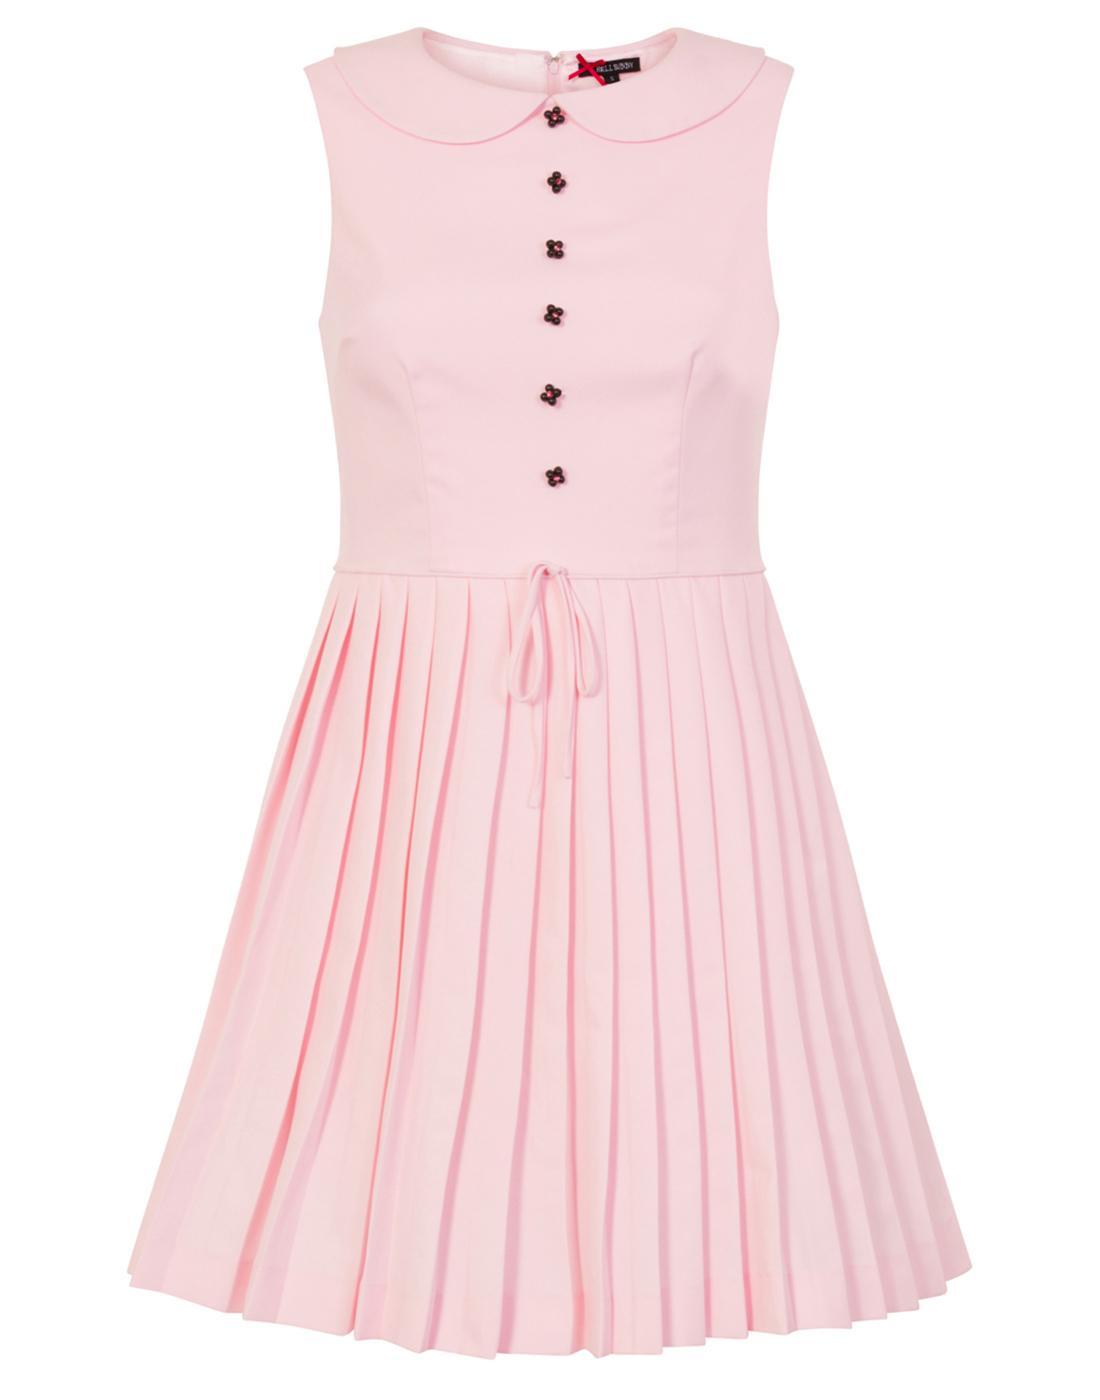 Josephine HELL BUNNY 60s Retro Mod Mini Dress P